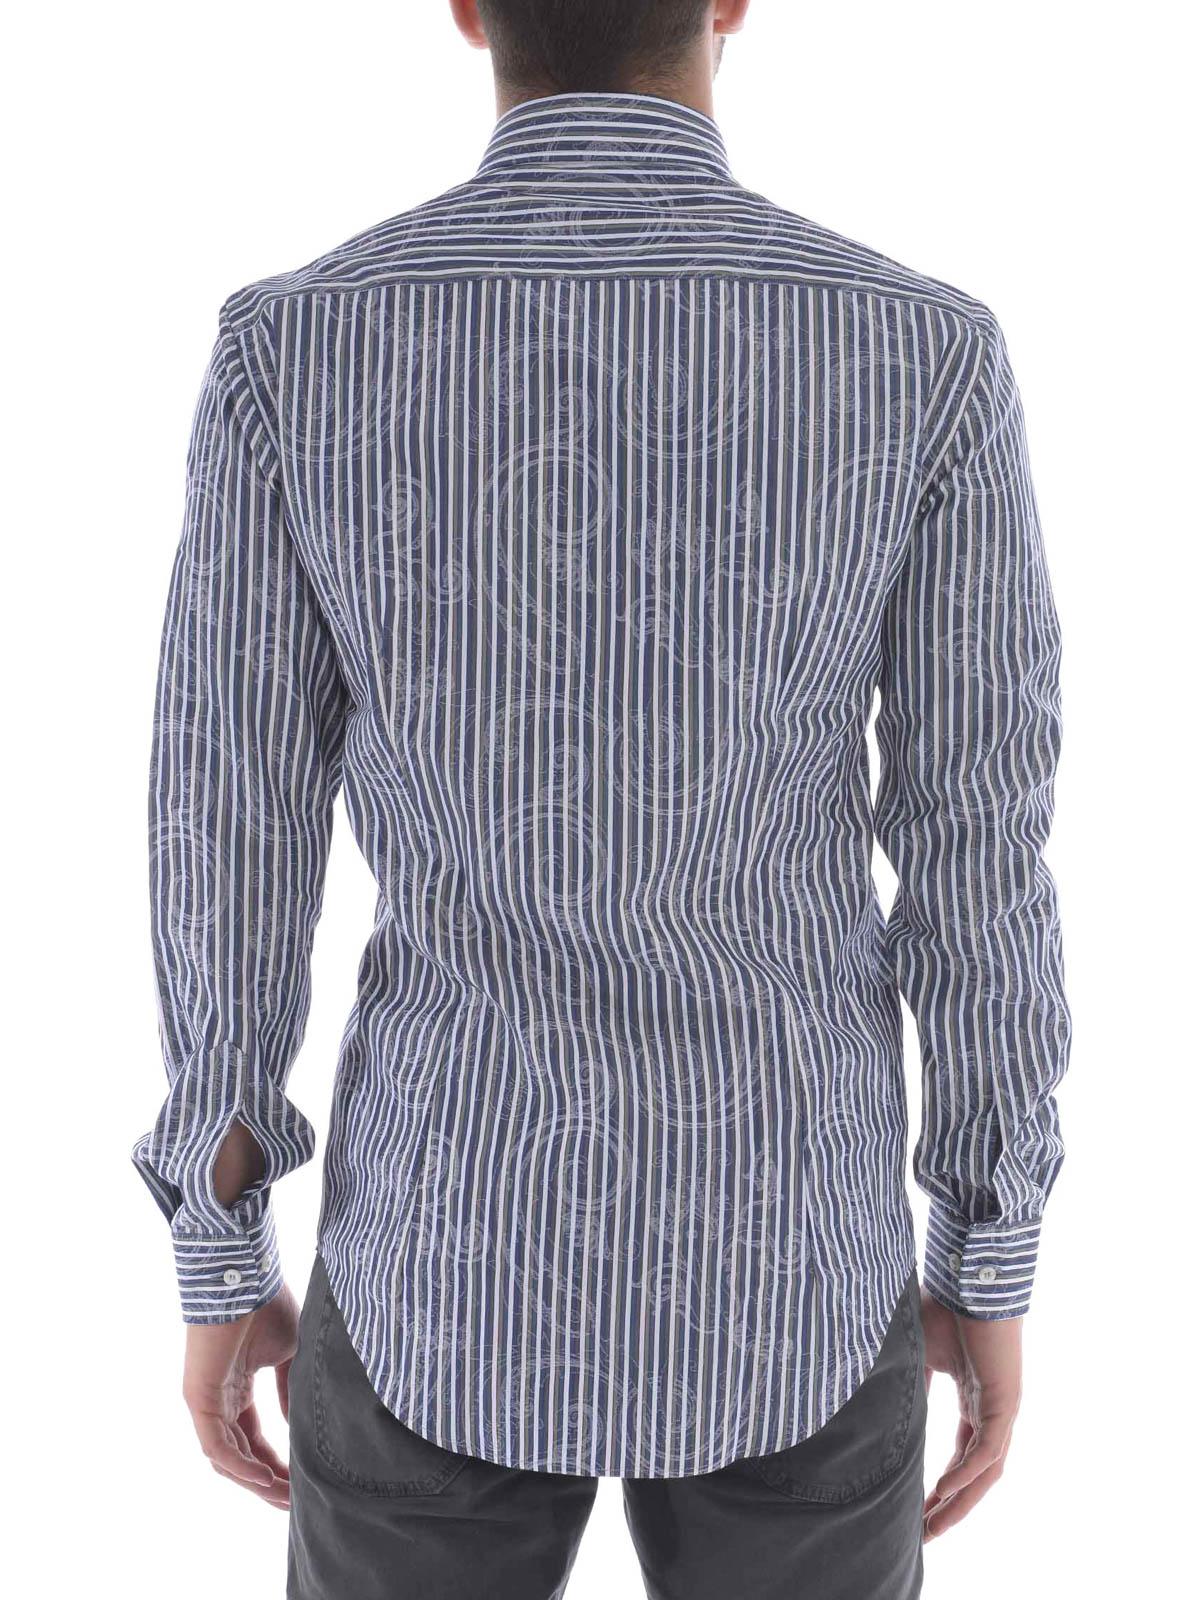 a810e8a28 Womens Paisley Patterned Shirts | Top Mode Depot